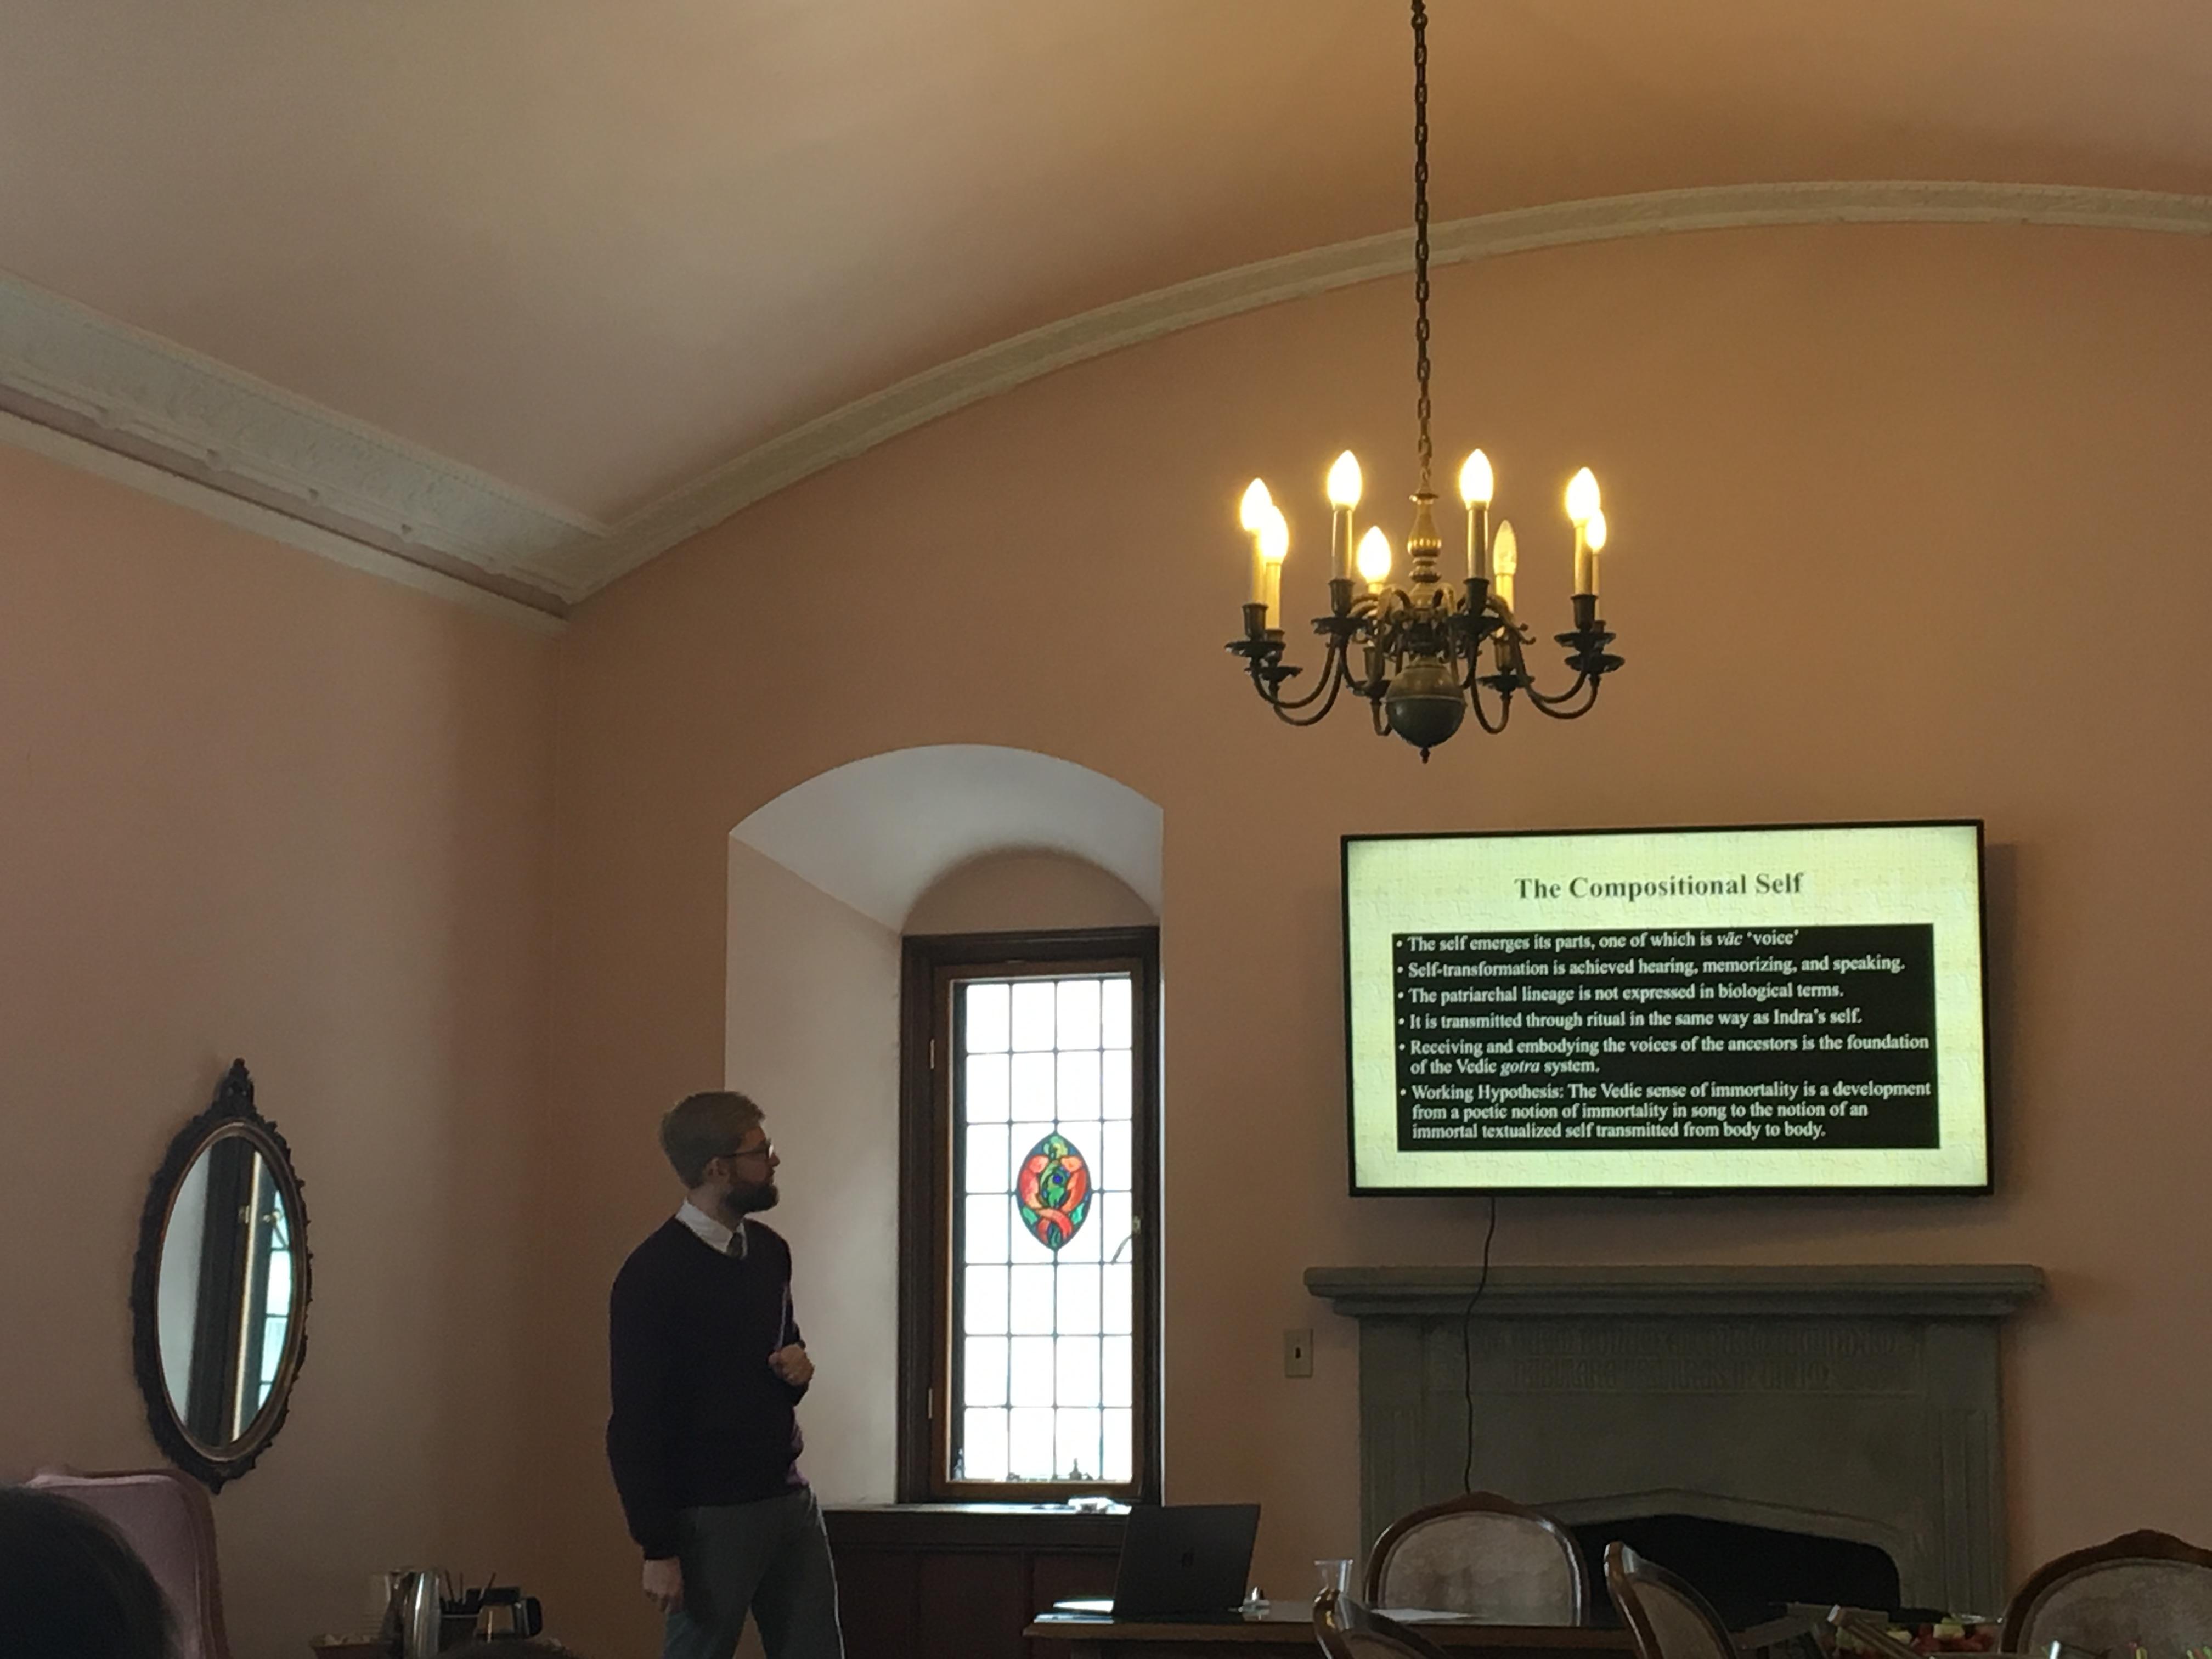 Dr. Smith explaining how orality led to self-transformation (Photo courtesy of Jingjing LI)